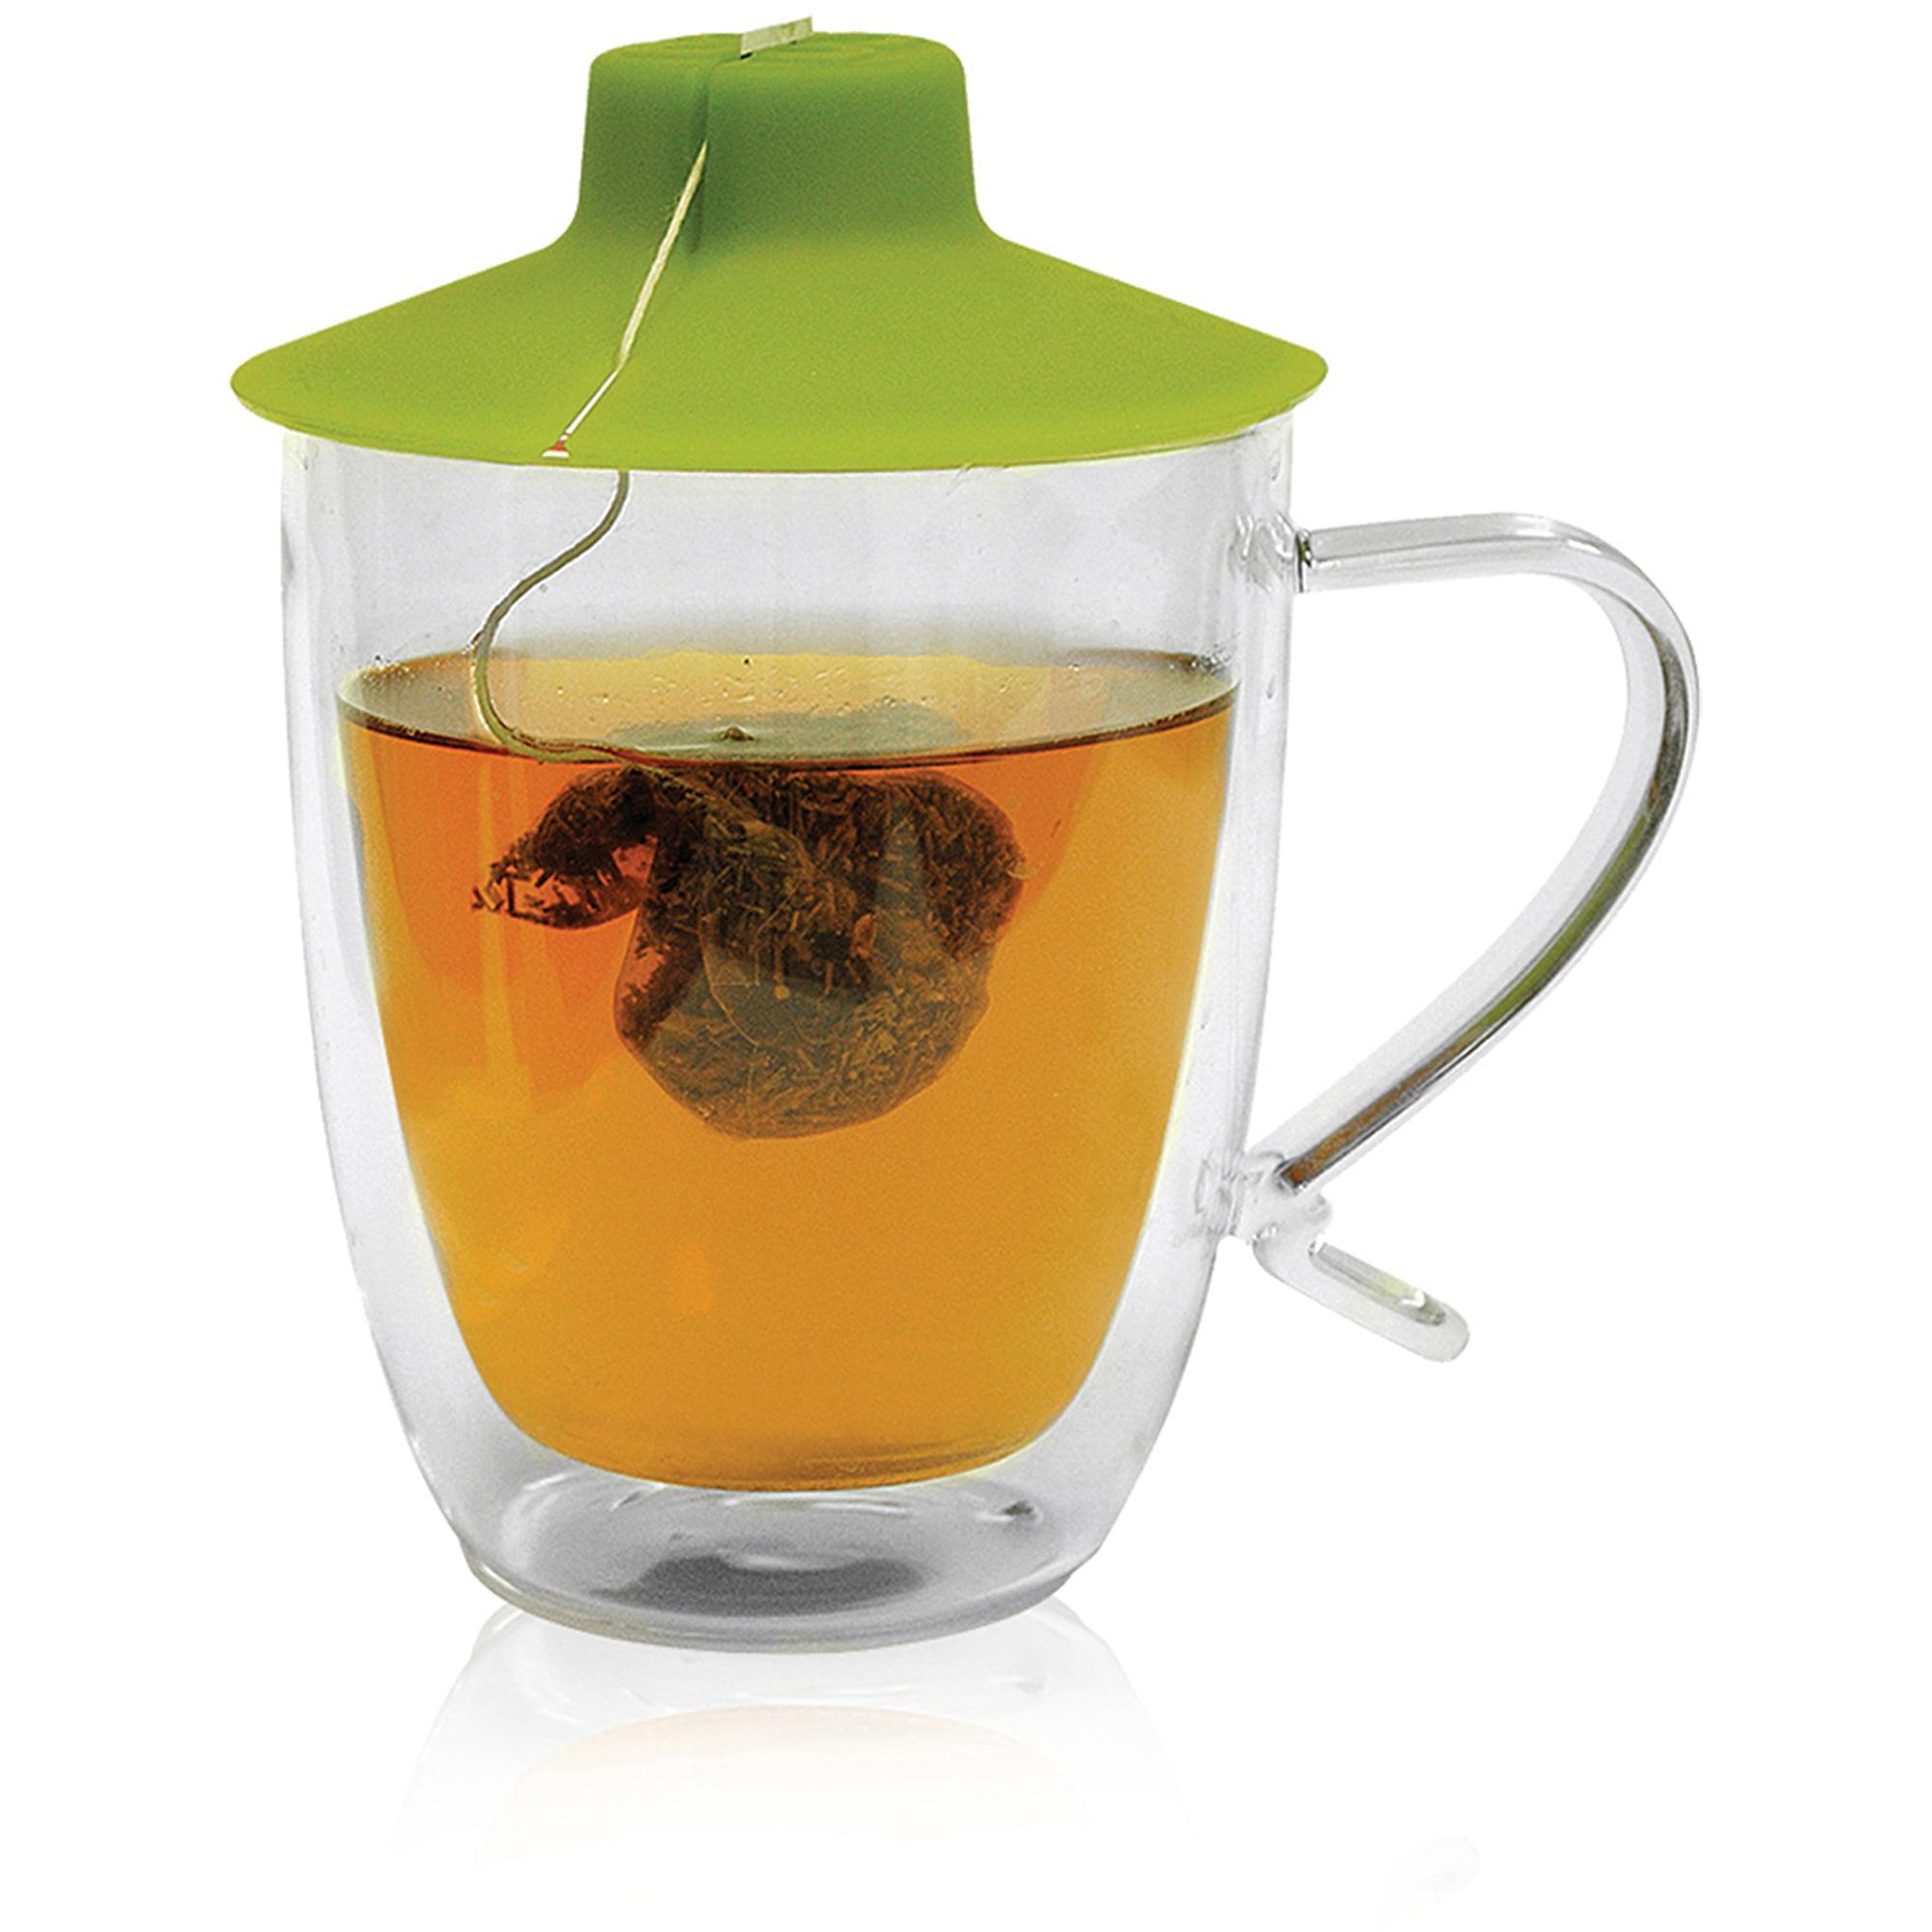 Primula Double Wall 16 oz Mug with Tea Bag Buddy